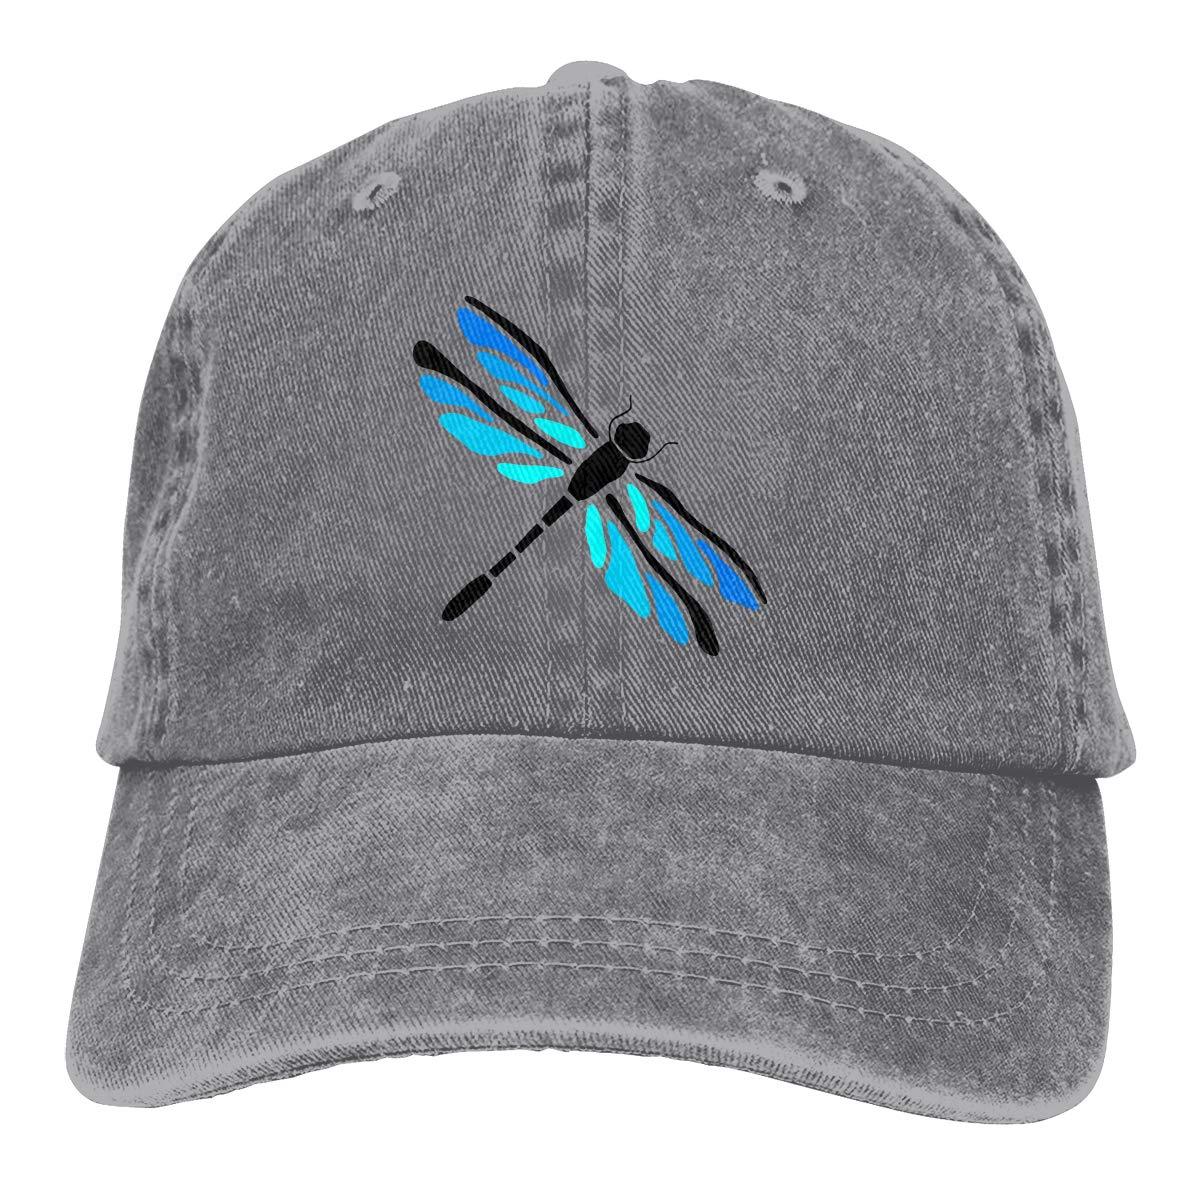 Qbeir Adult Unisex Jeans Cap Adjustable Hat Dragonfly Gift Cotton Denim